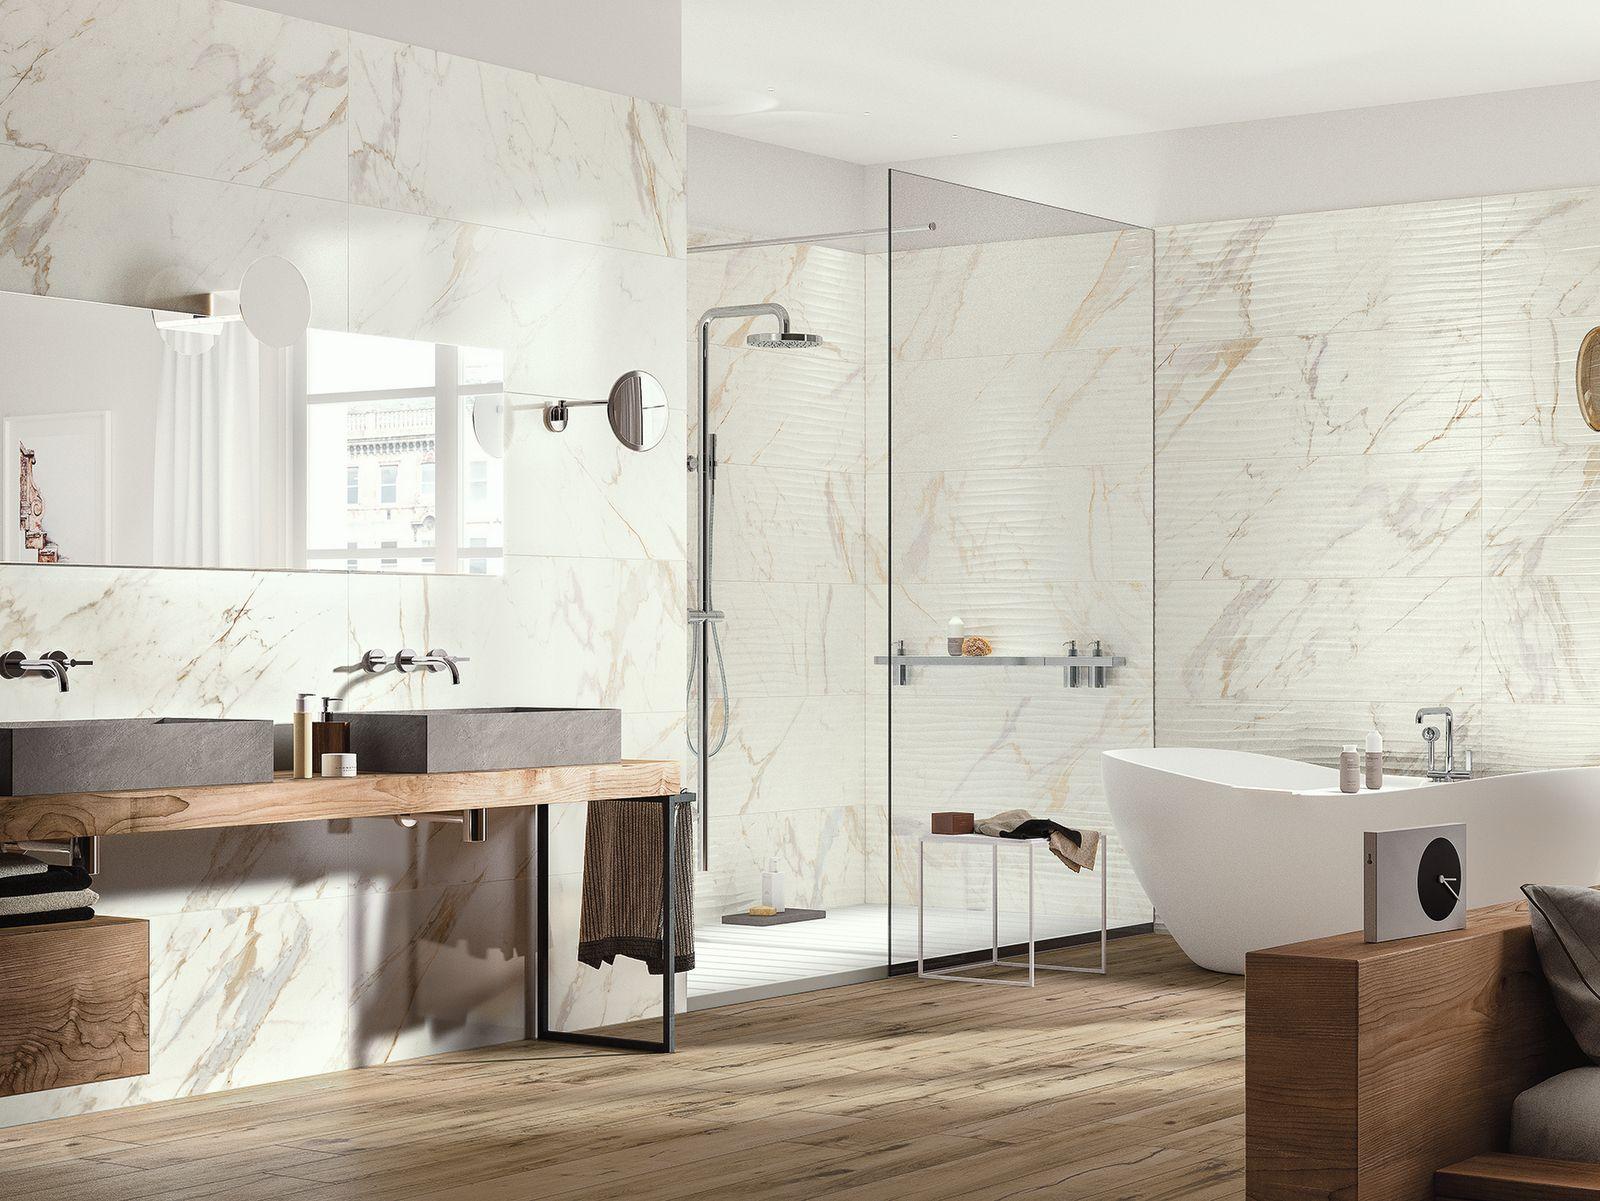 Keramisch marmer tegels - Badkamer licht | Pinterest - Tegels ...